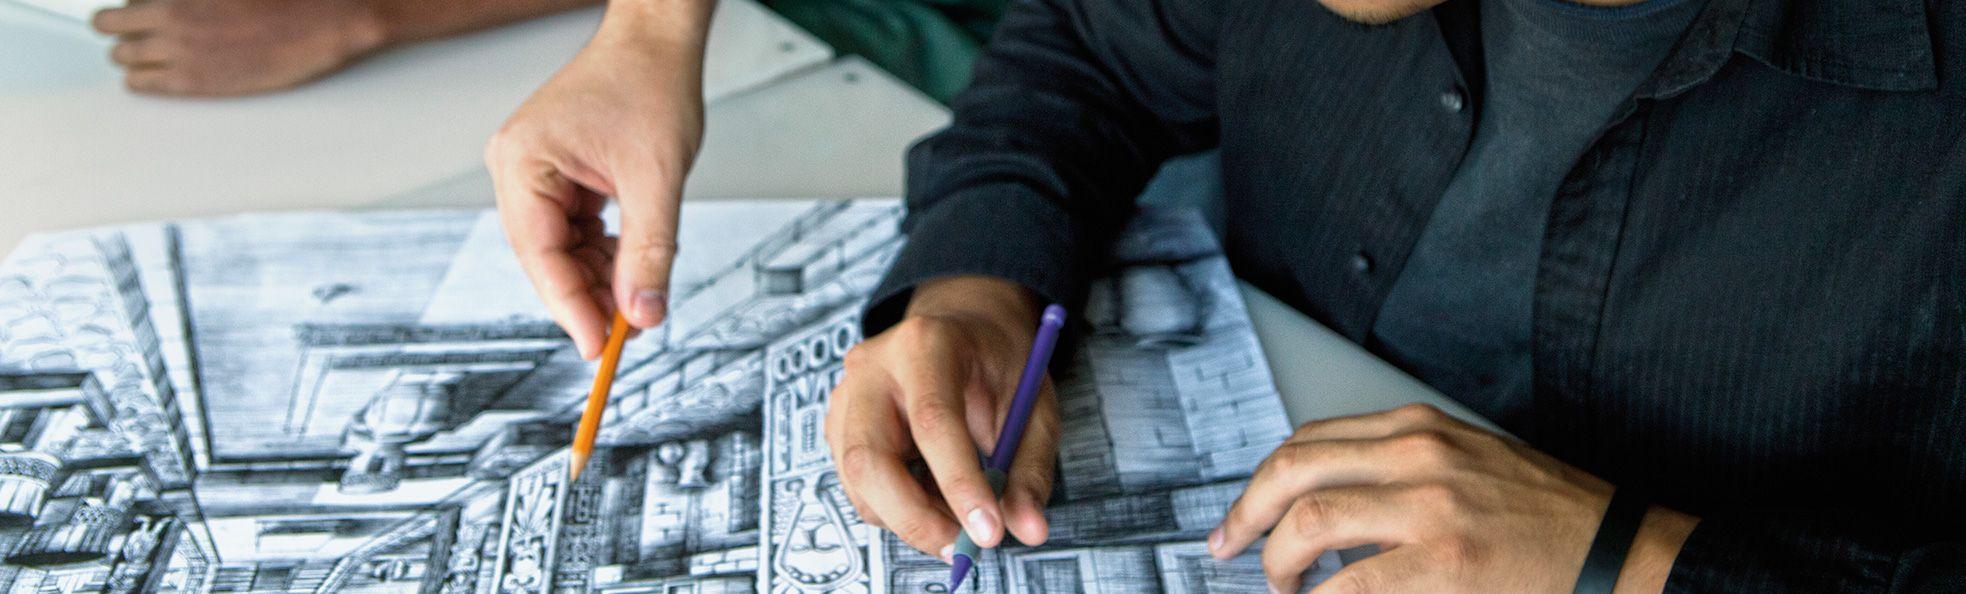 Game Design And Programming Near Future Pinterest Game Design - The art institute game design